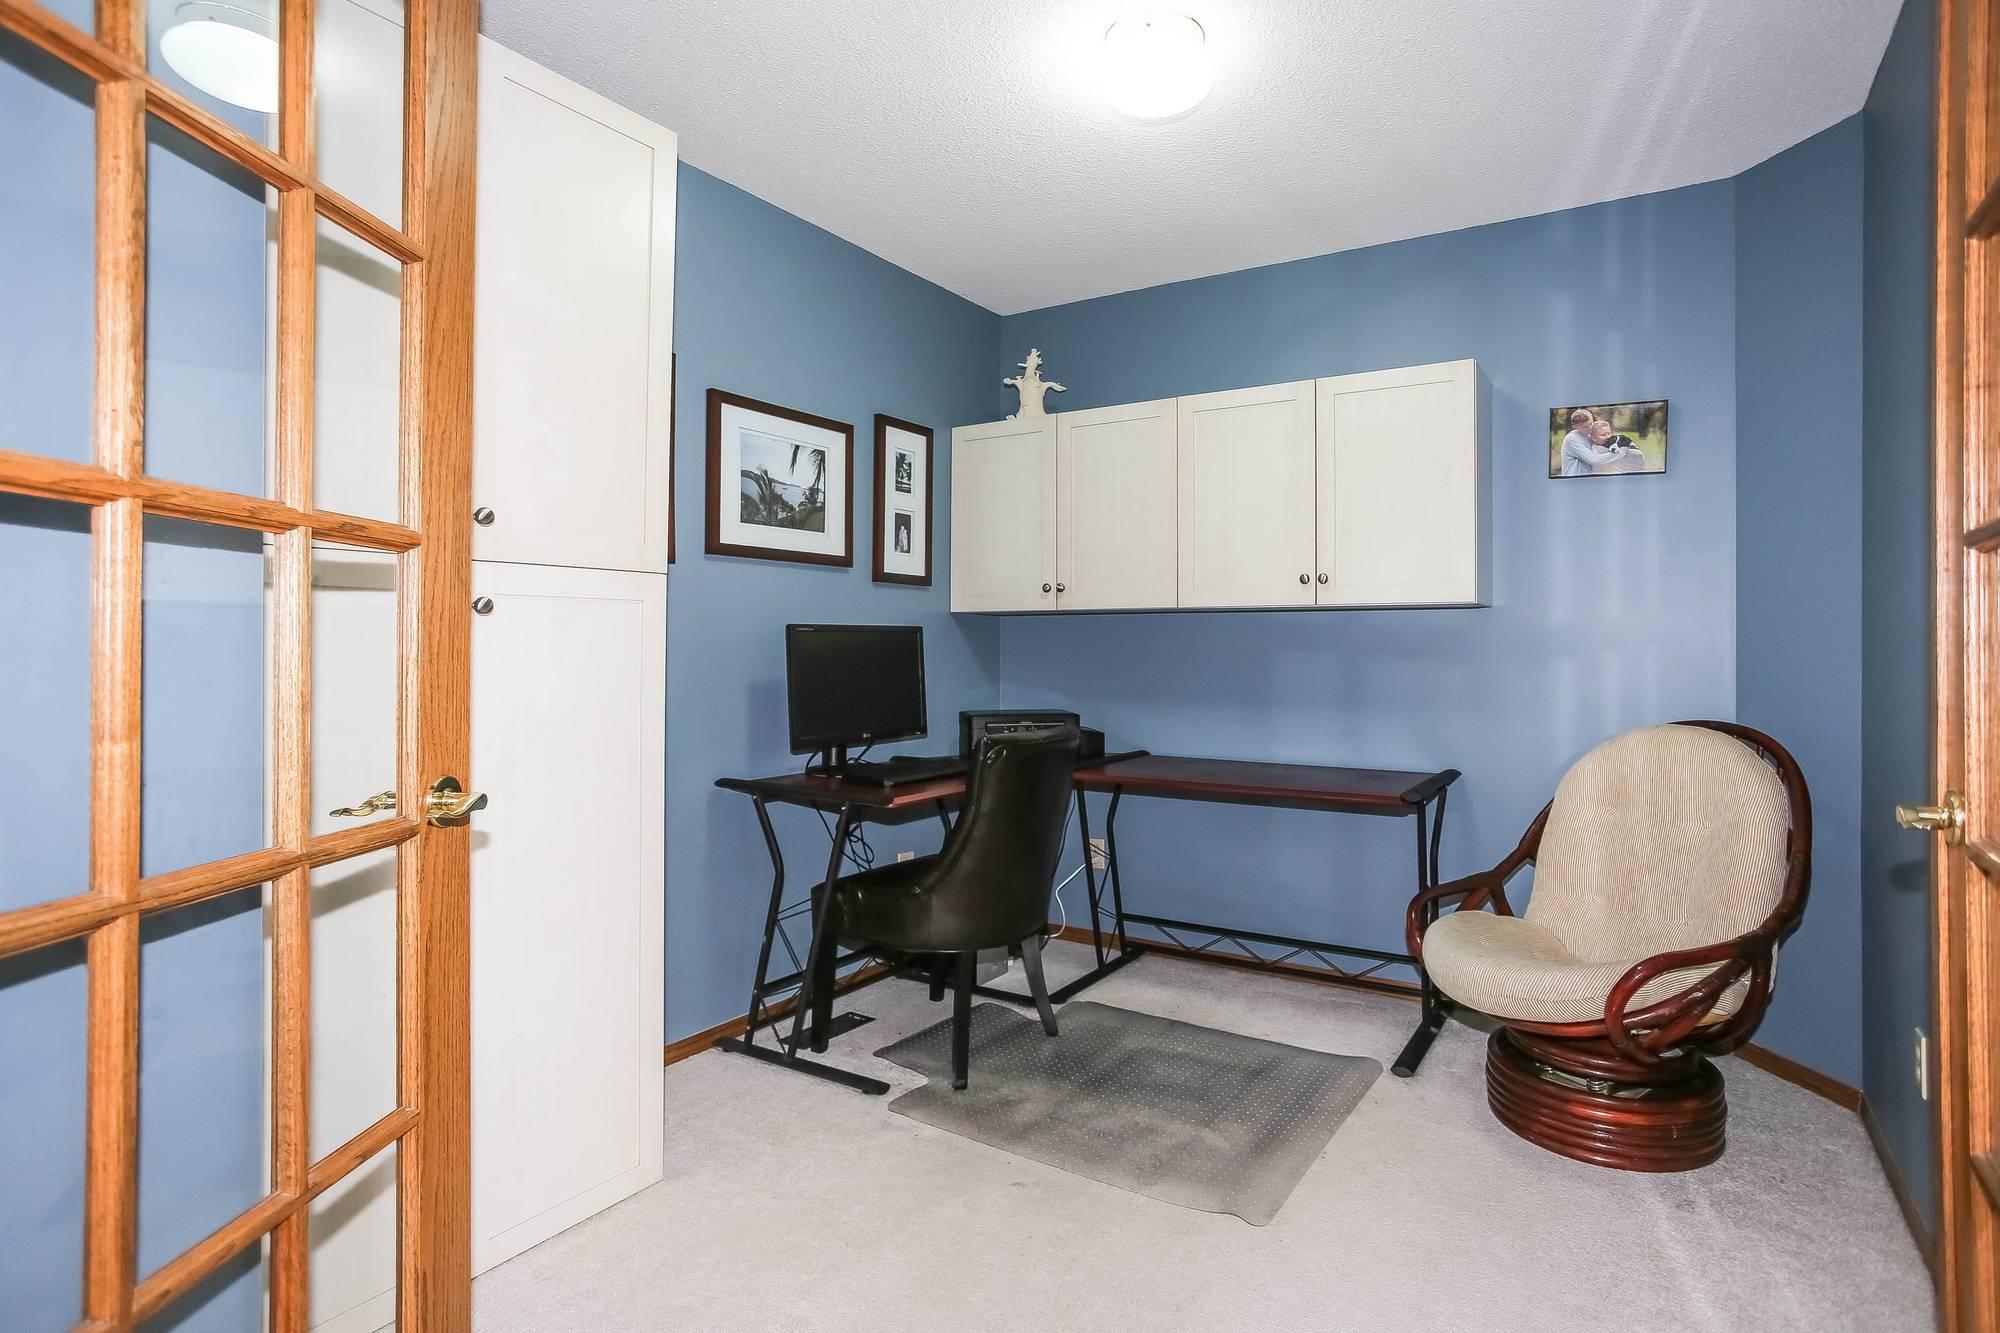 151 Huntingdale Road, Winnipeg, Manitoba  R2C 0W4 - Photo 24 - 202006415